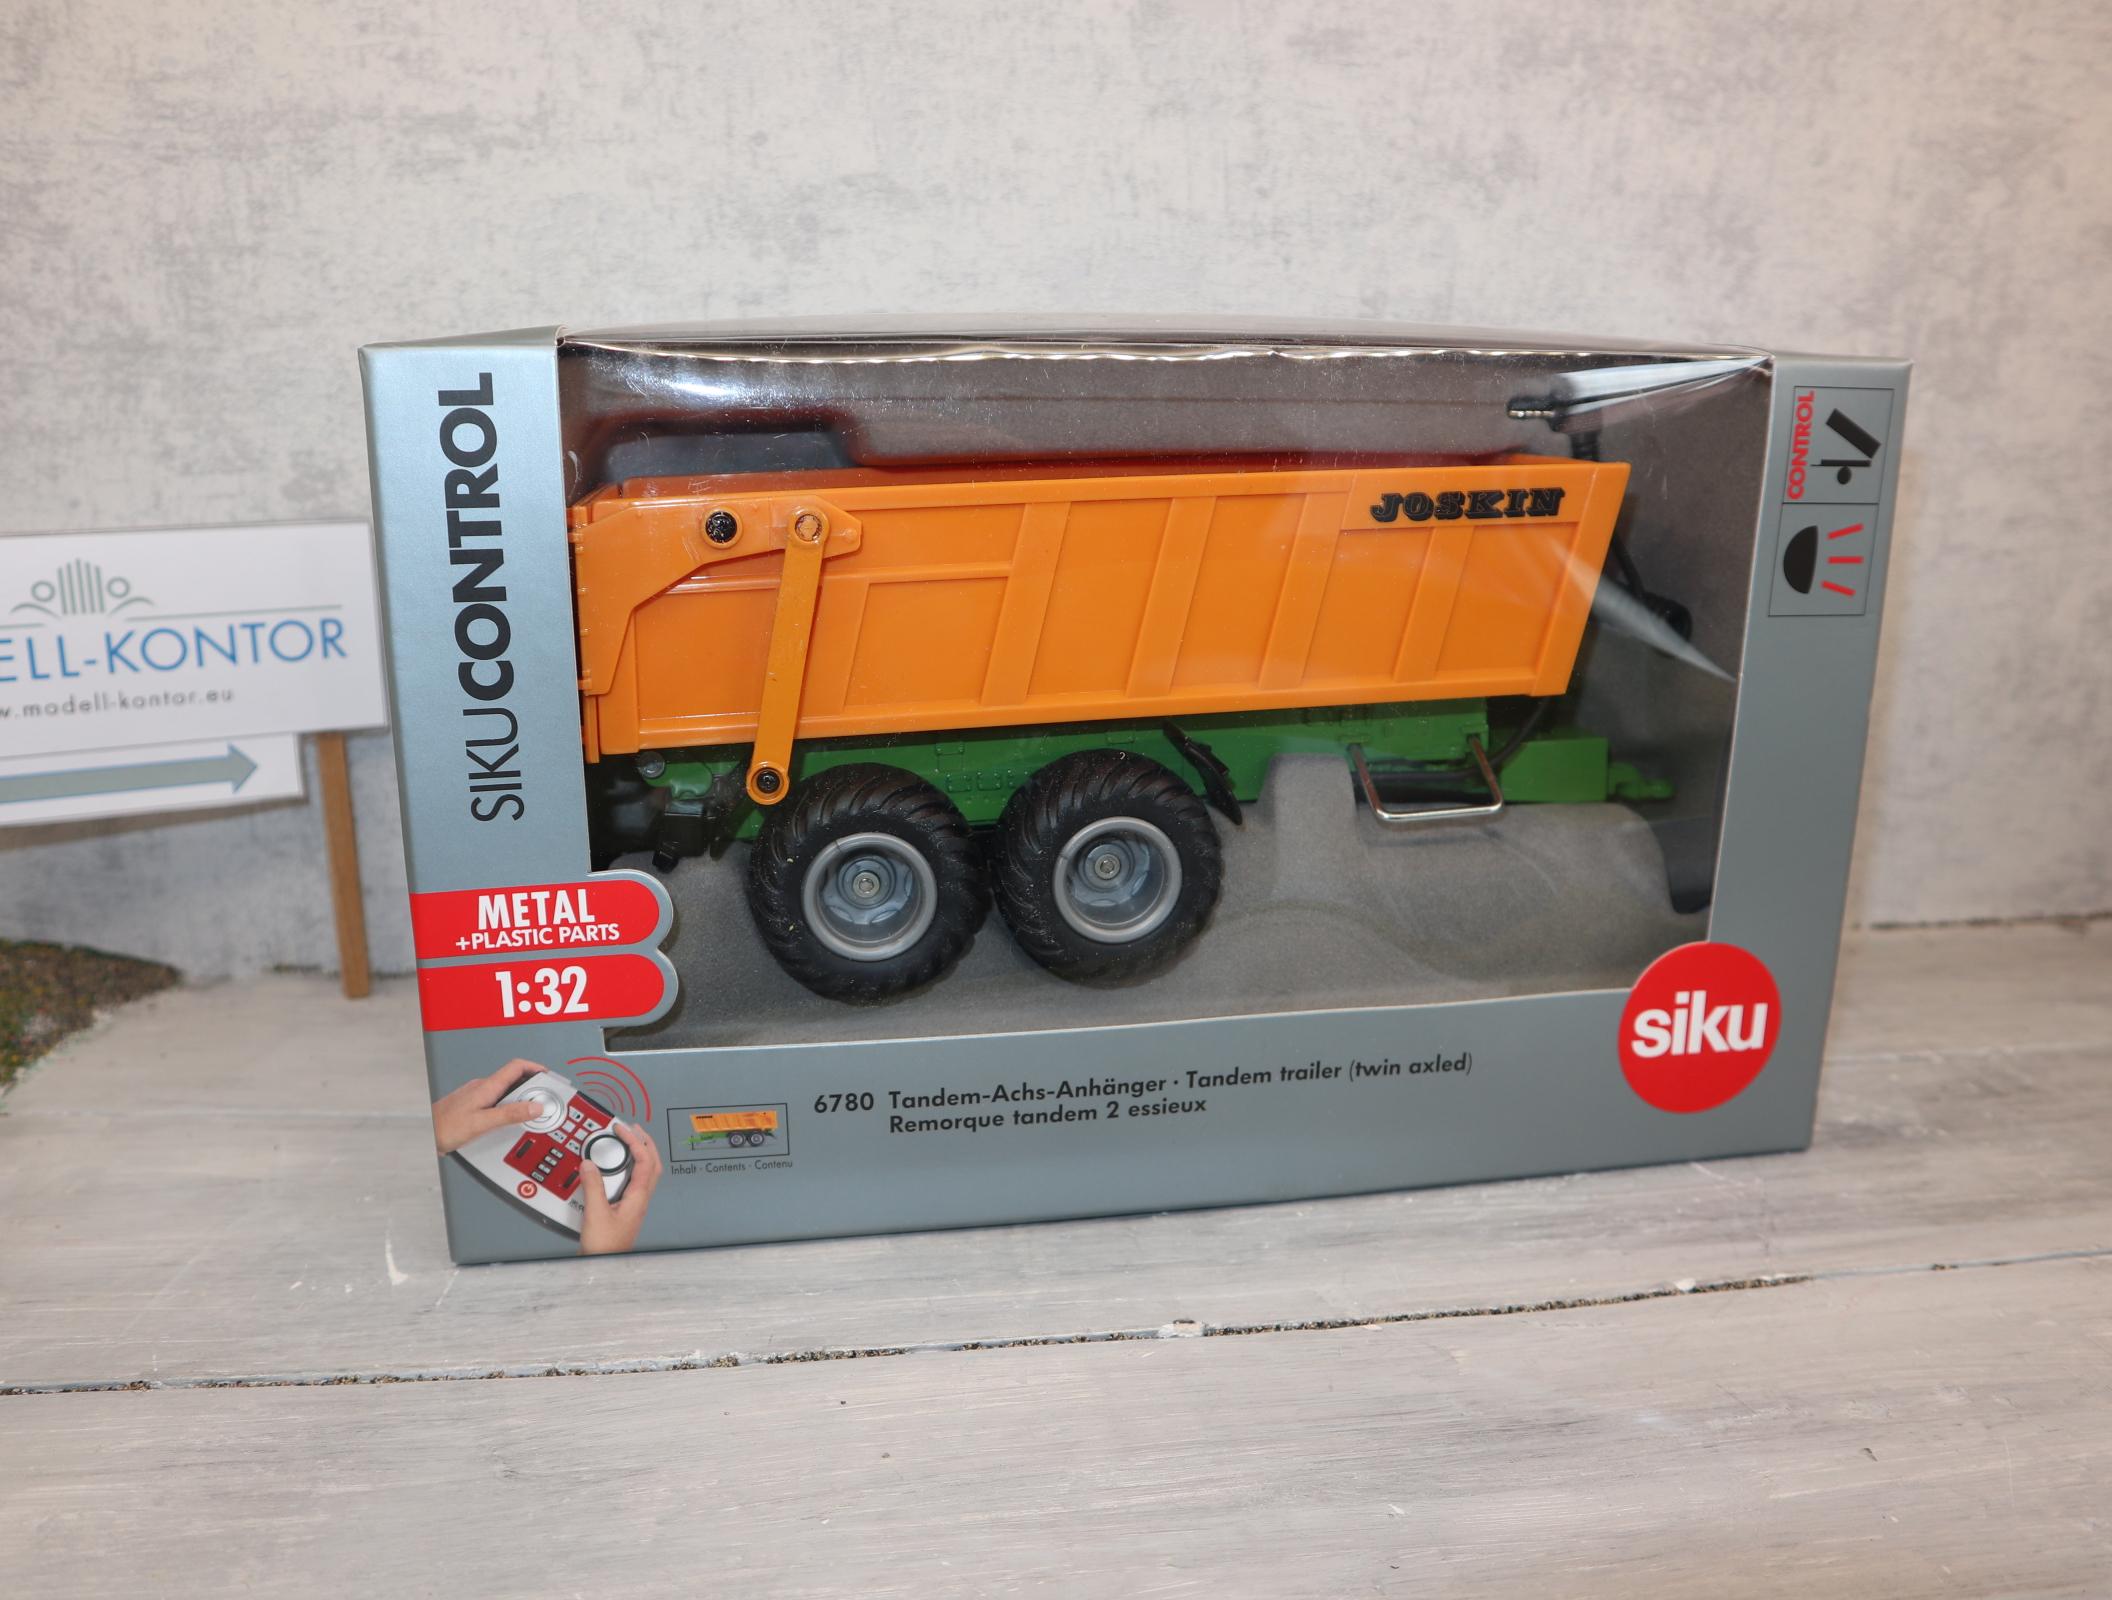 Siku 6780 1:32 Control Tandem-Hinterkipper orange ohne eigenen Akku in OVP